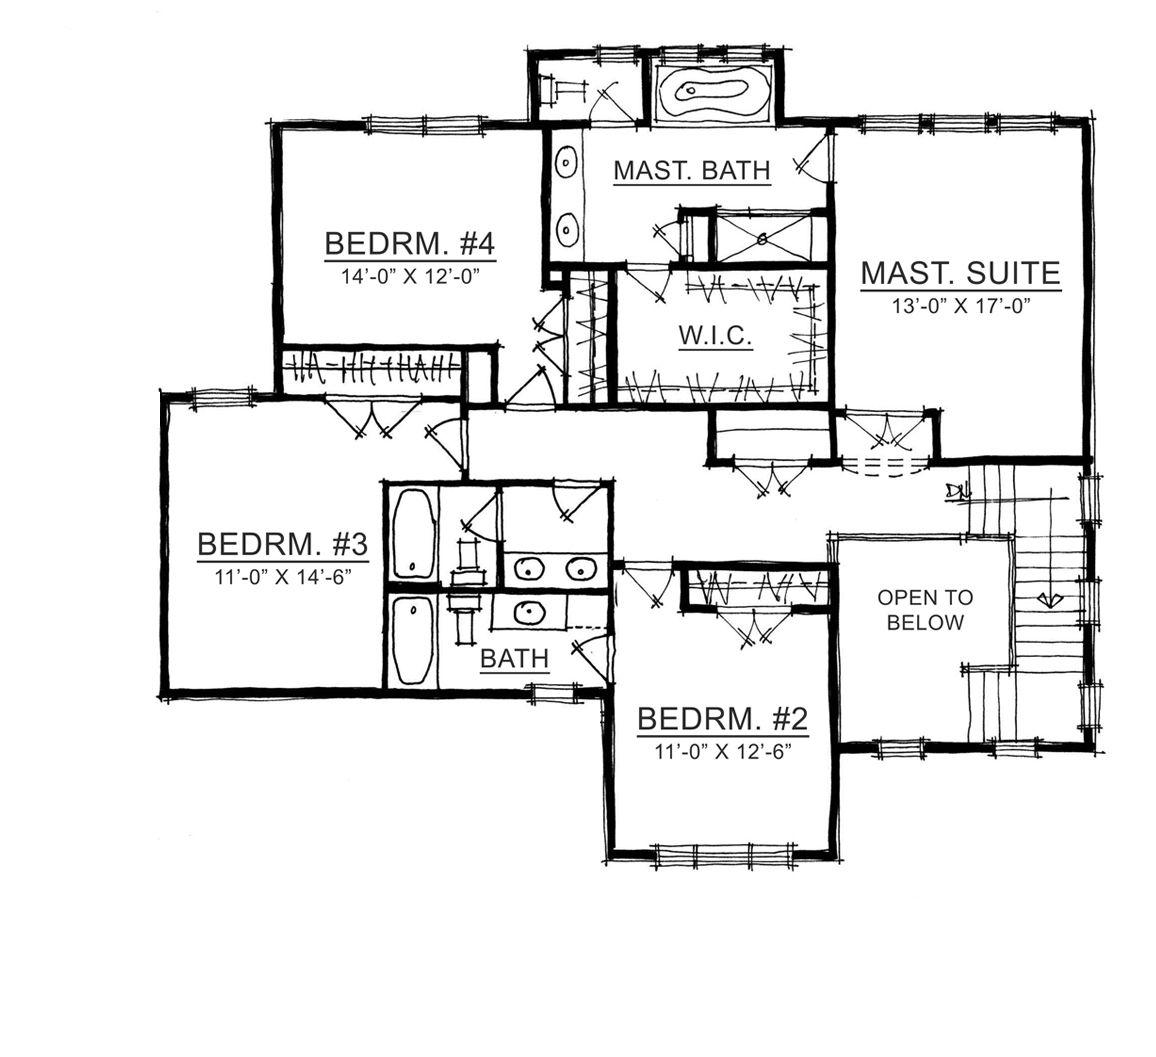 Anderson Hall By Estridge Homes Matthew Allen Realty Schematic Diagram 7230